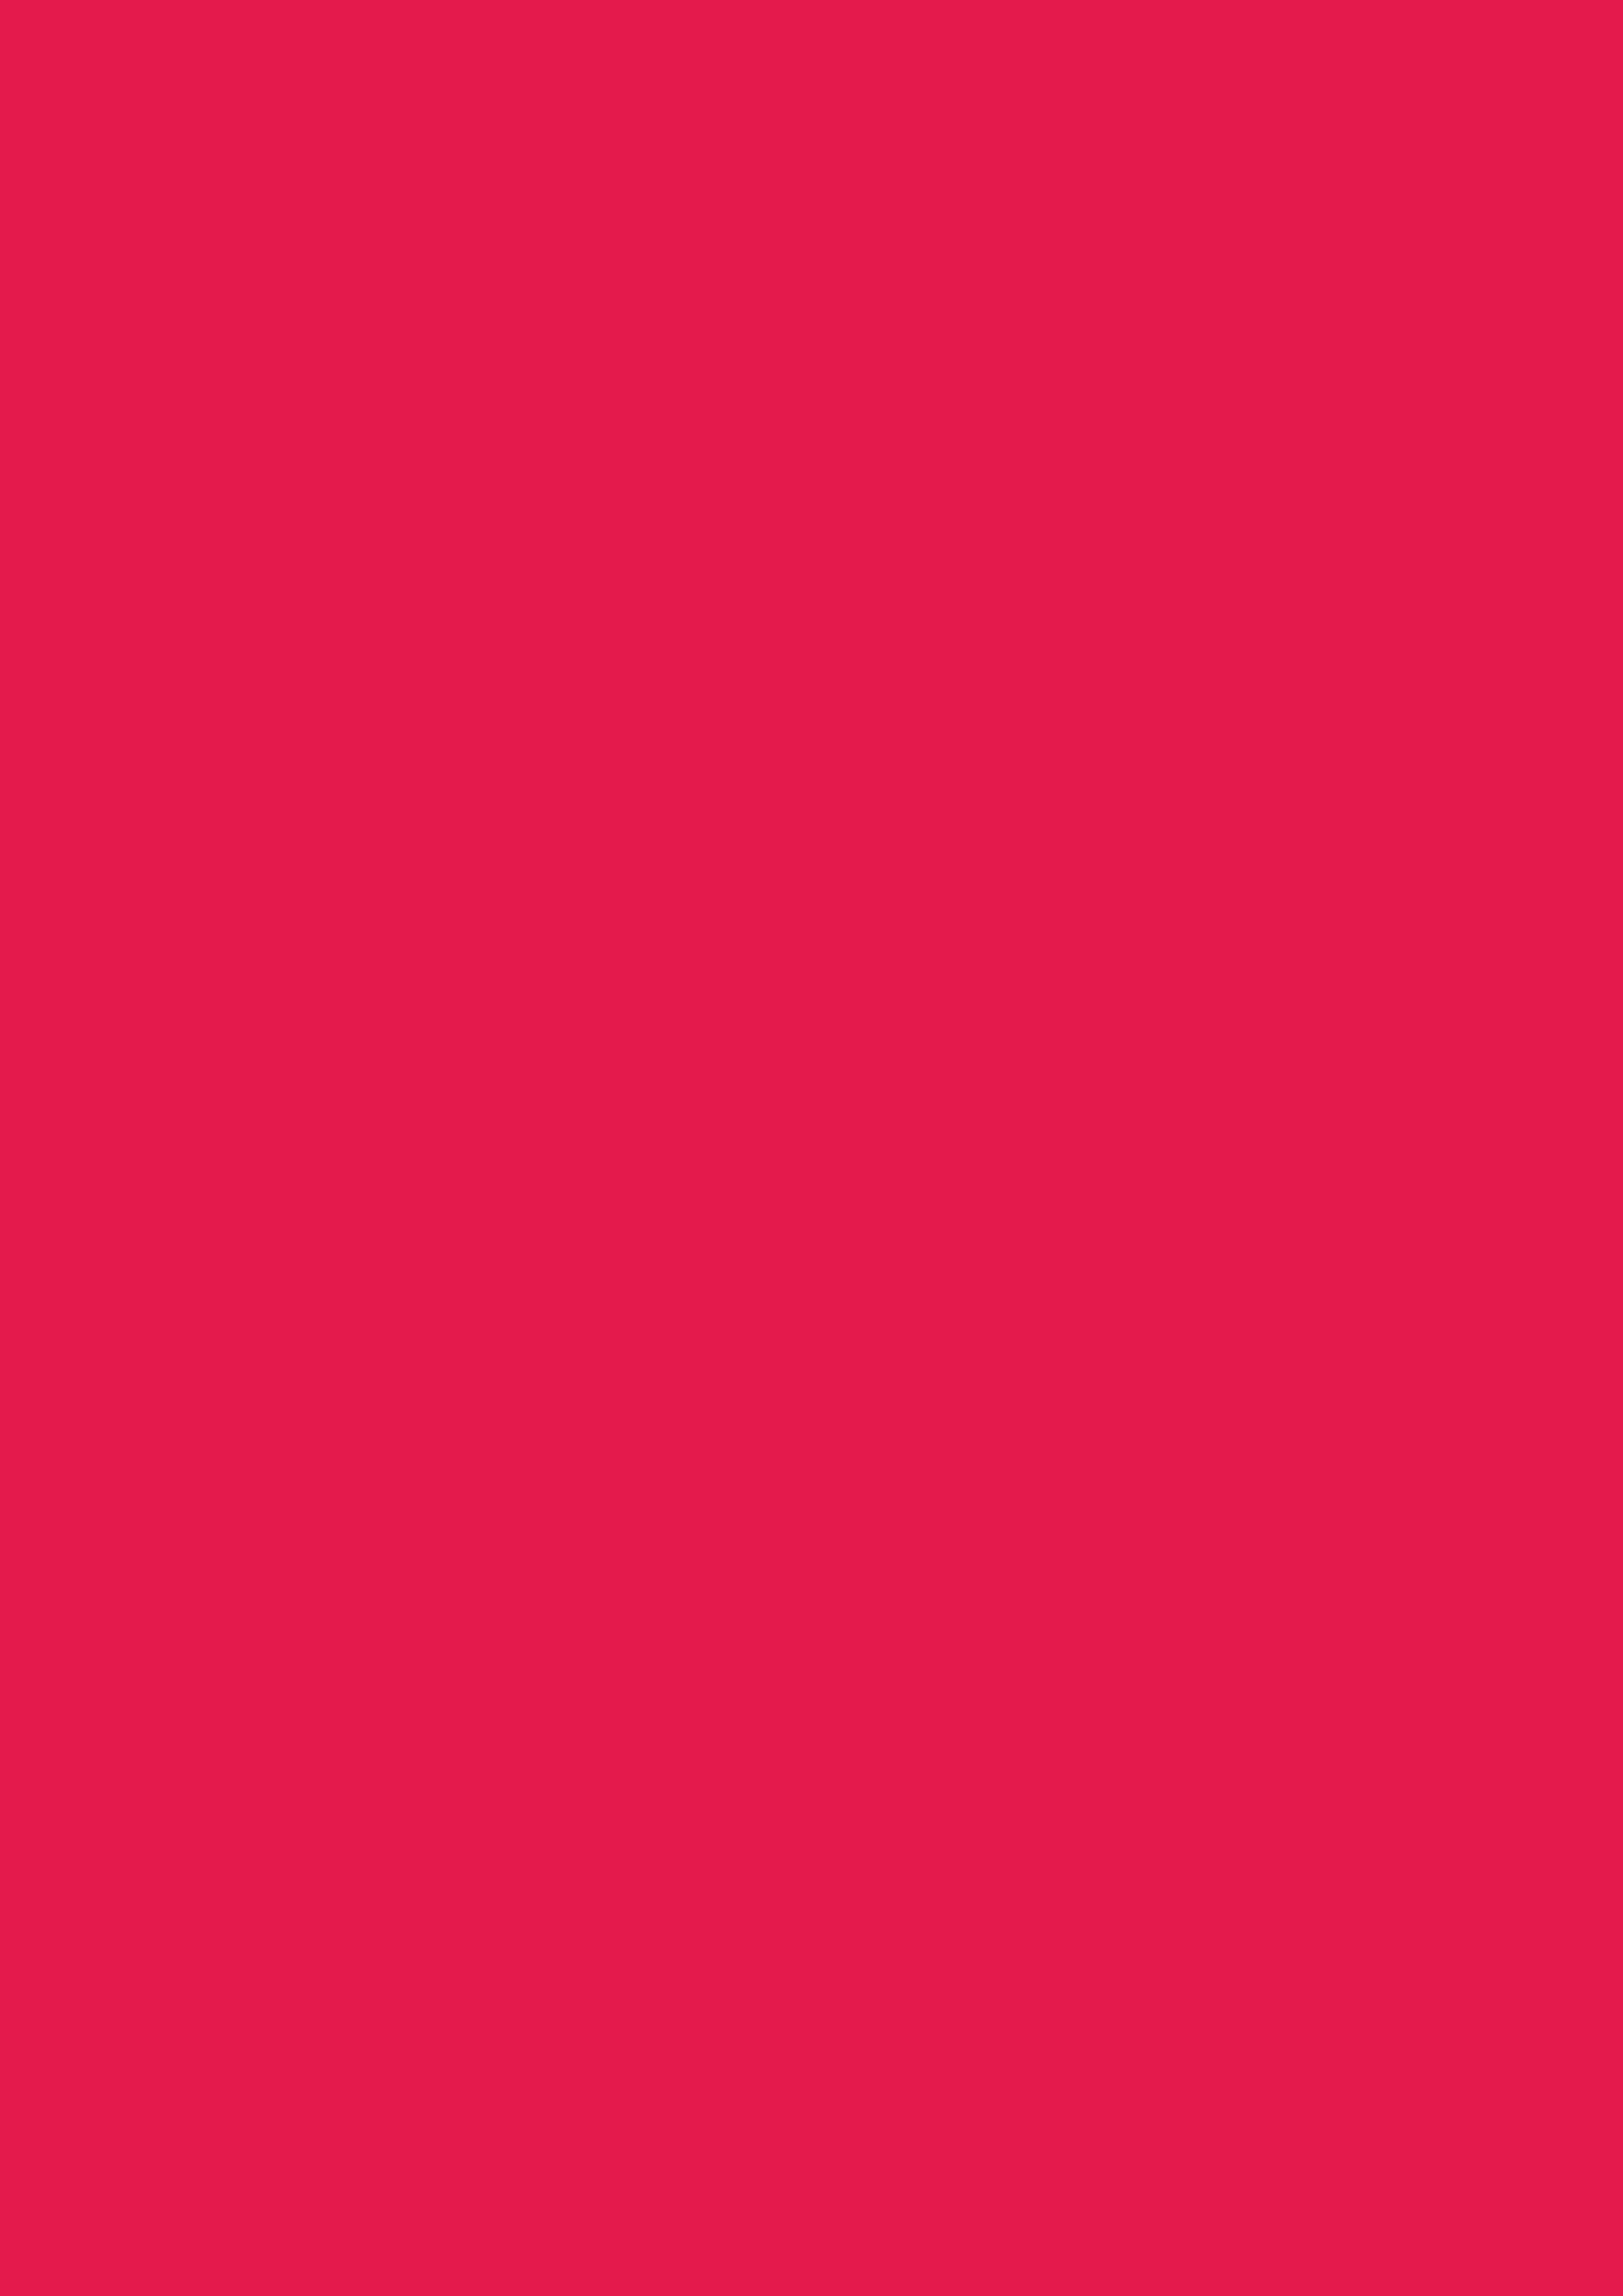 2480x3508 Spanish Crimson Solid Color Background